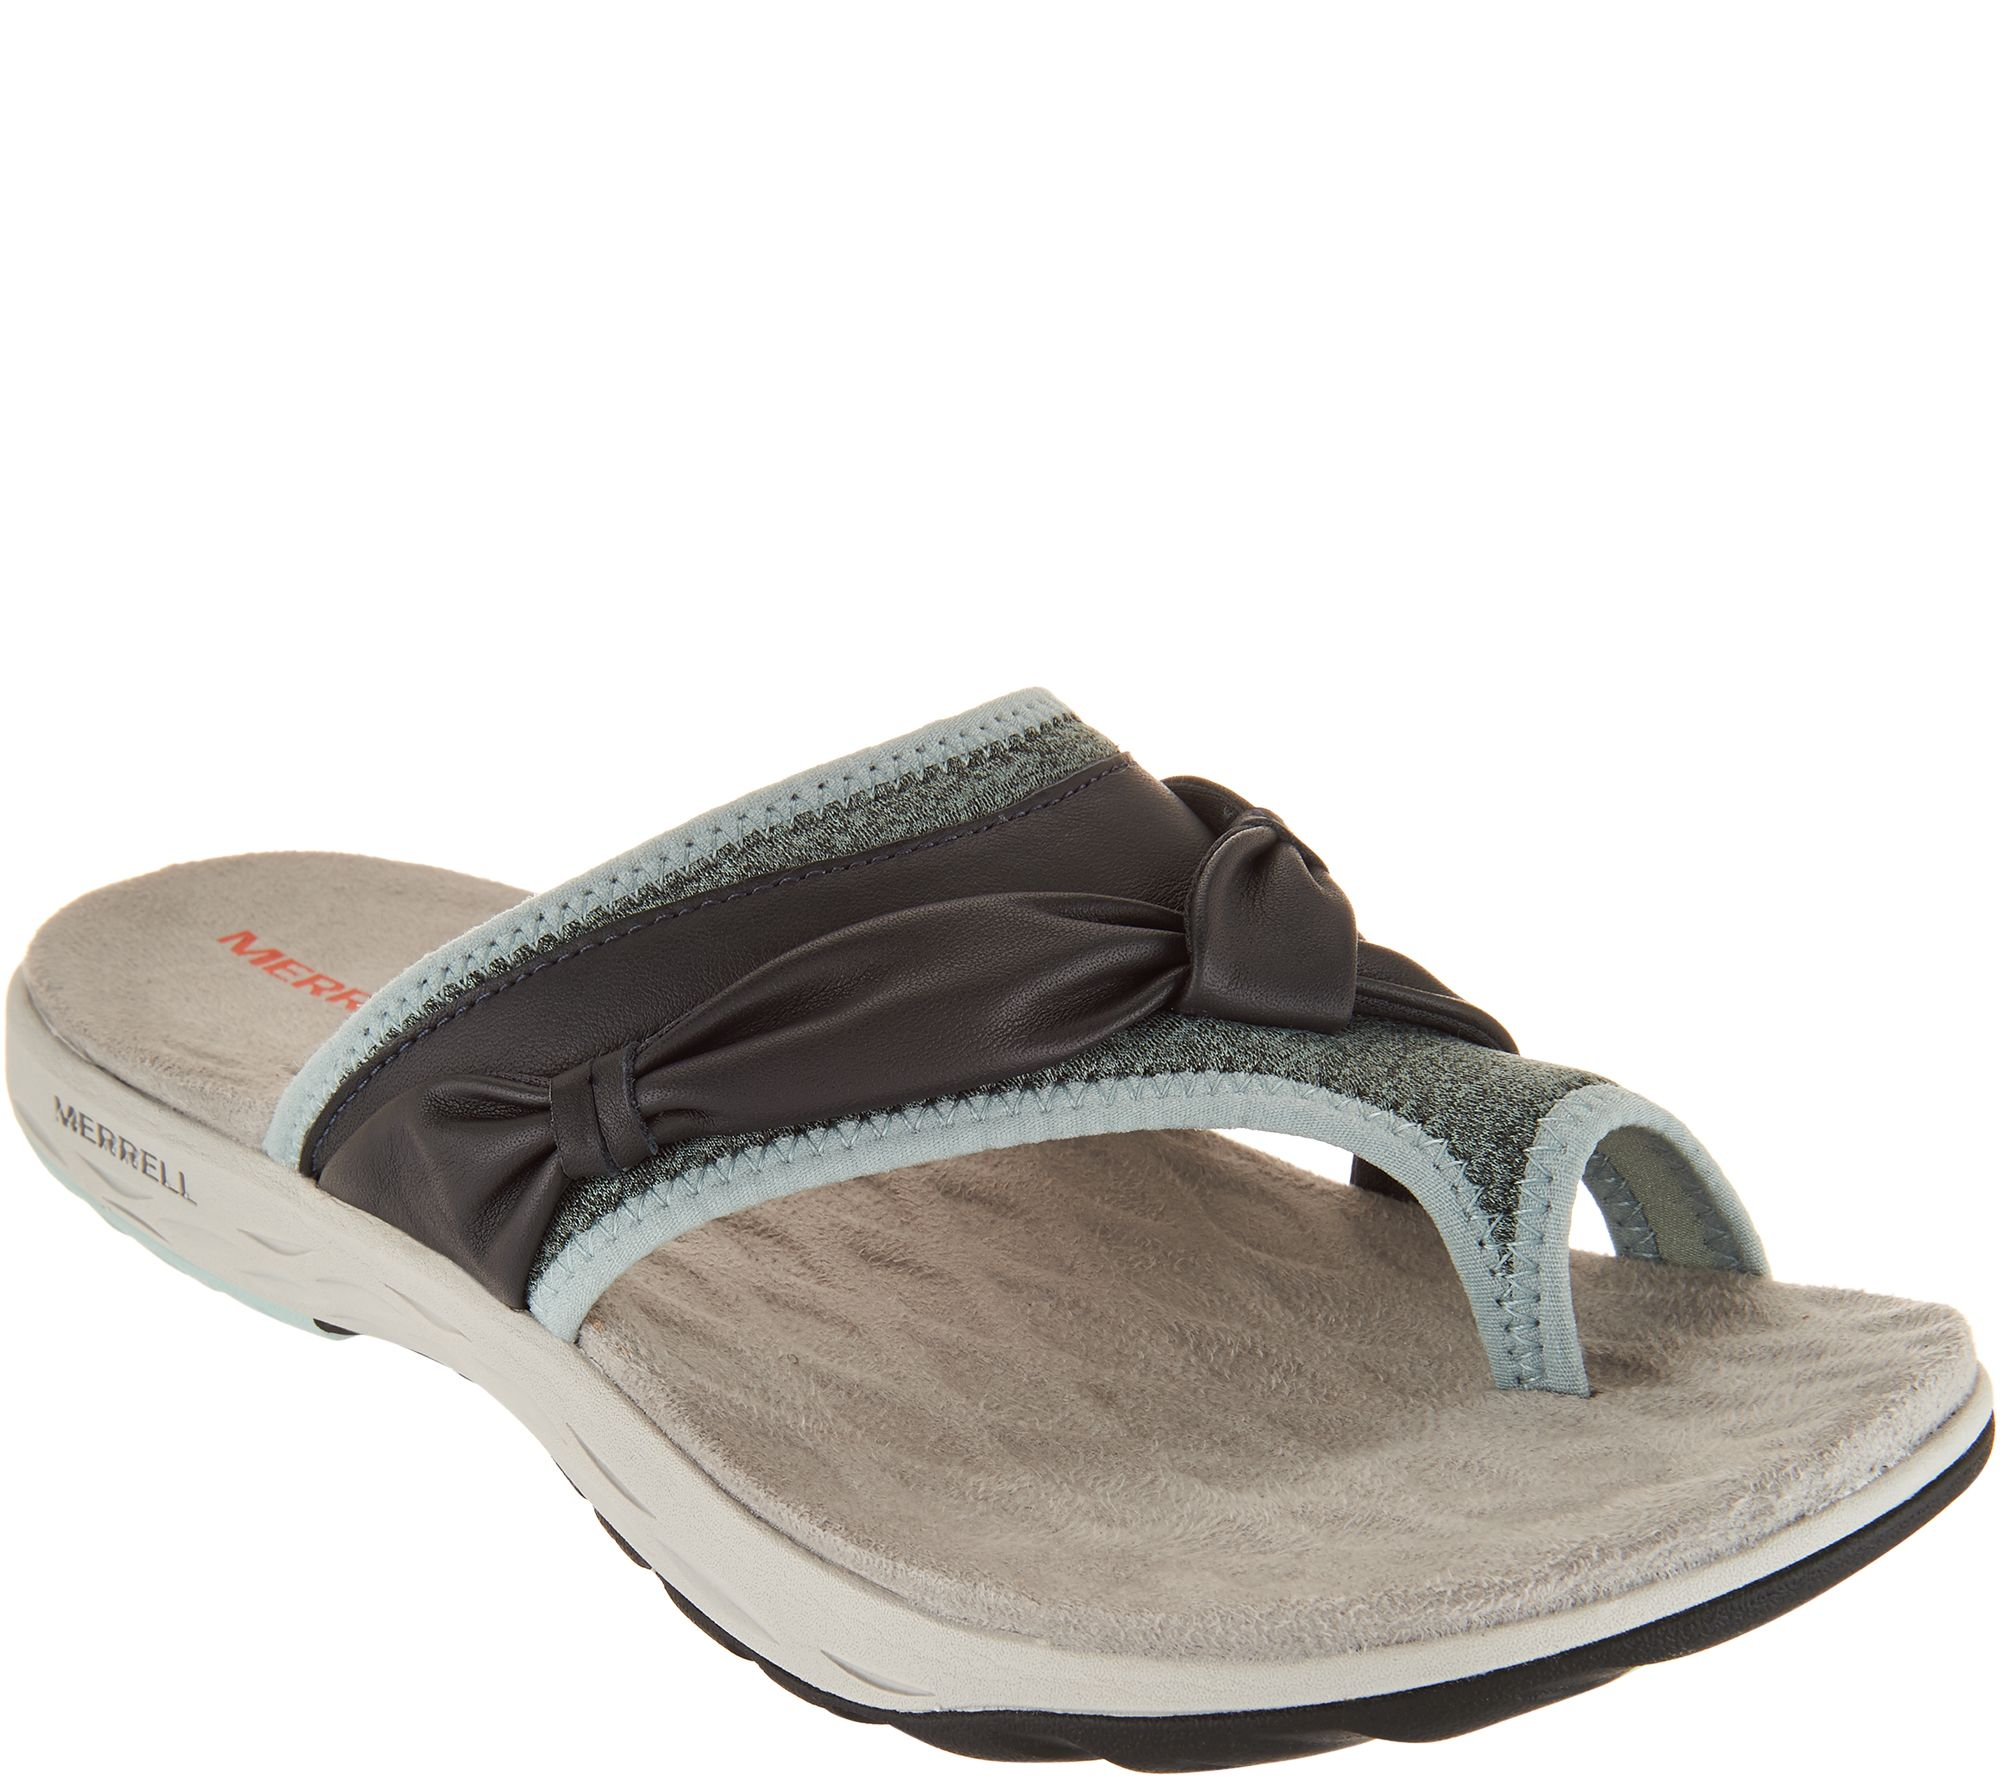 e4558ca5d67e Merrell Leather Sport Thong Sandals - Vesper Thong - Page 1 — QVC.com